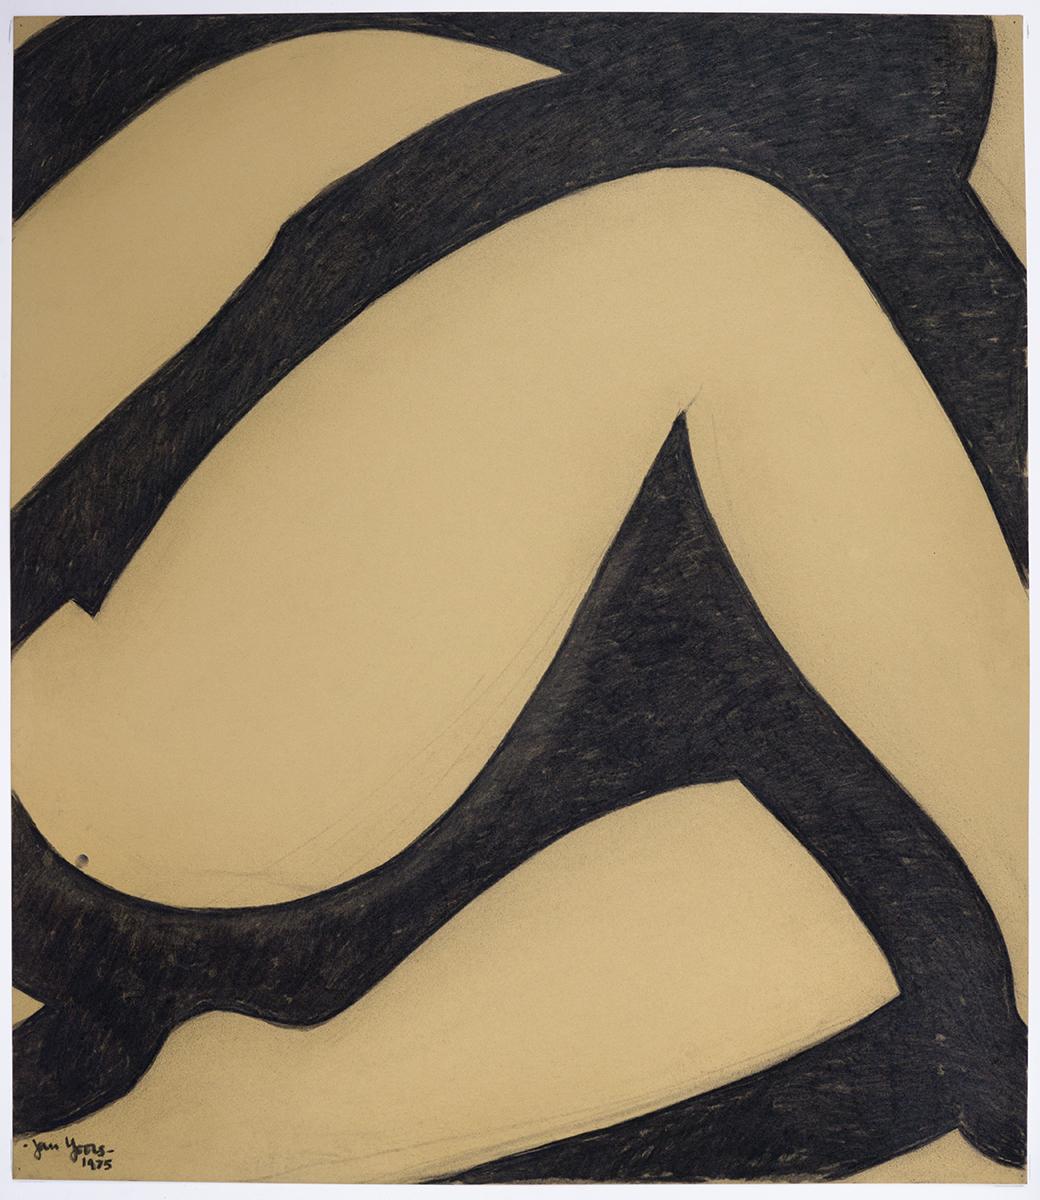 Nude (G-15.1), 1975